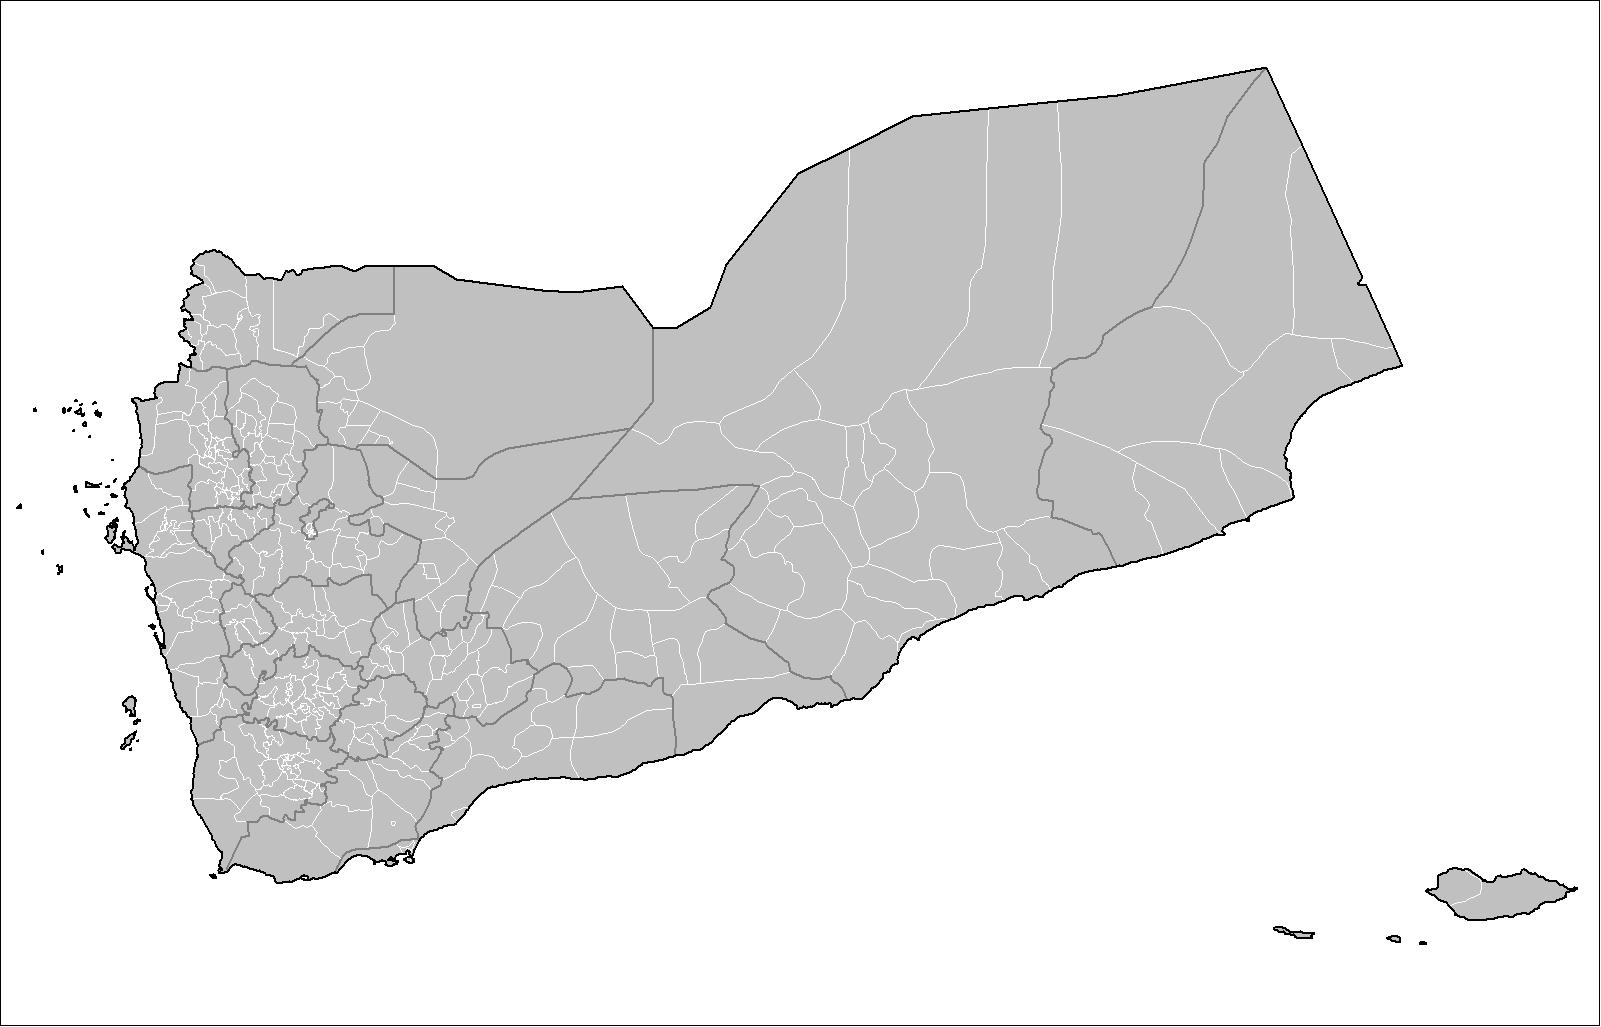 FileYemen Districtspng Wikimedia Commons - Yemen map png